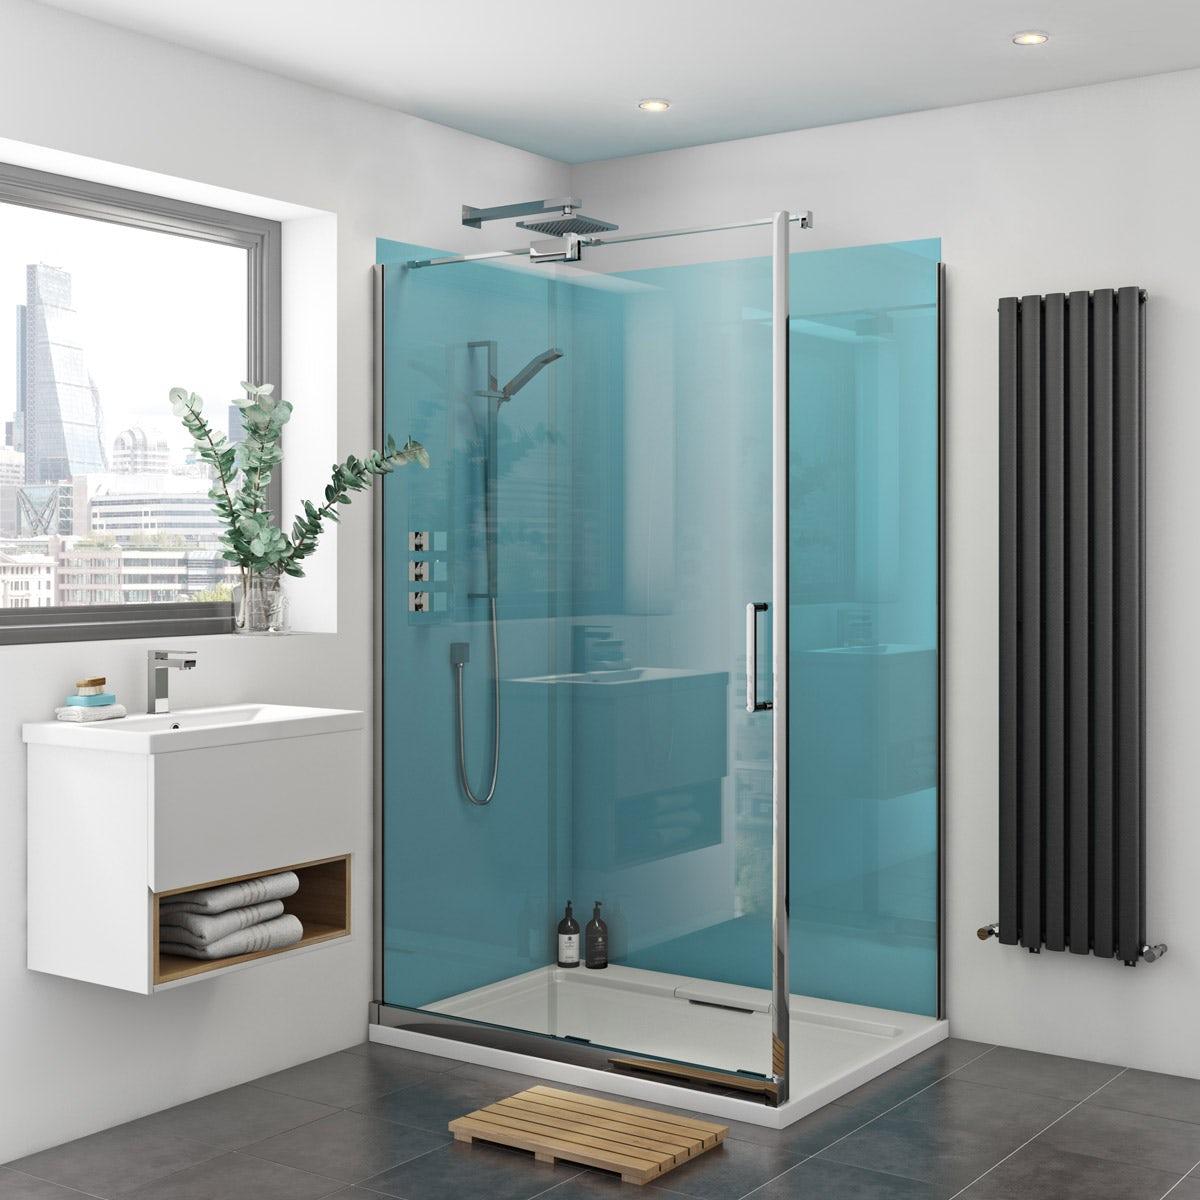 zenolite acrylic panels victoriaplum com rh victoriaplum com Acrylic Wall Panels for Kitchens Plastic Shower Wall Panels